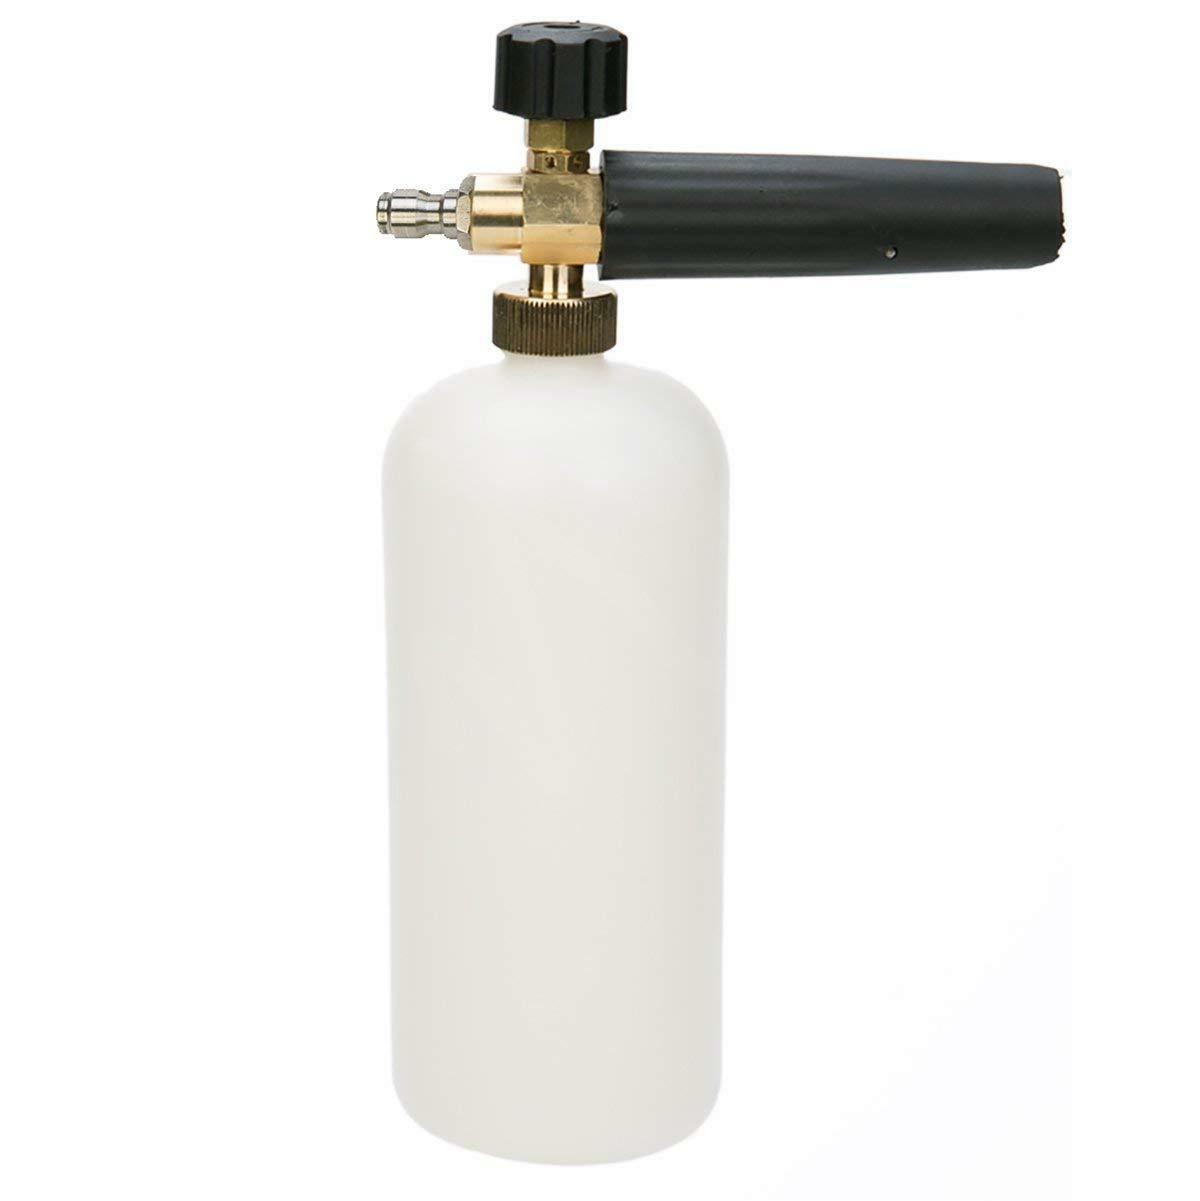 foam cannon bottle lance for pressure washer